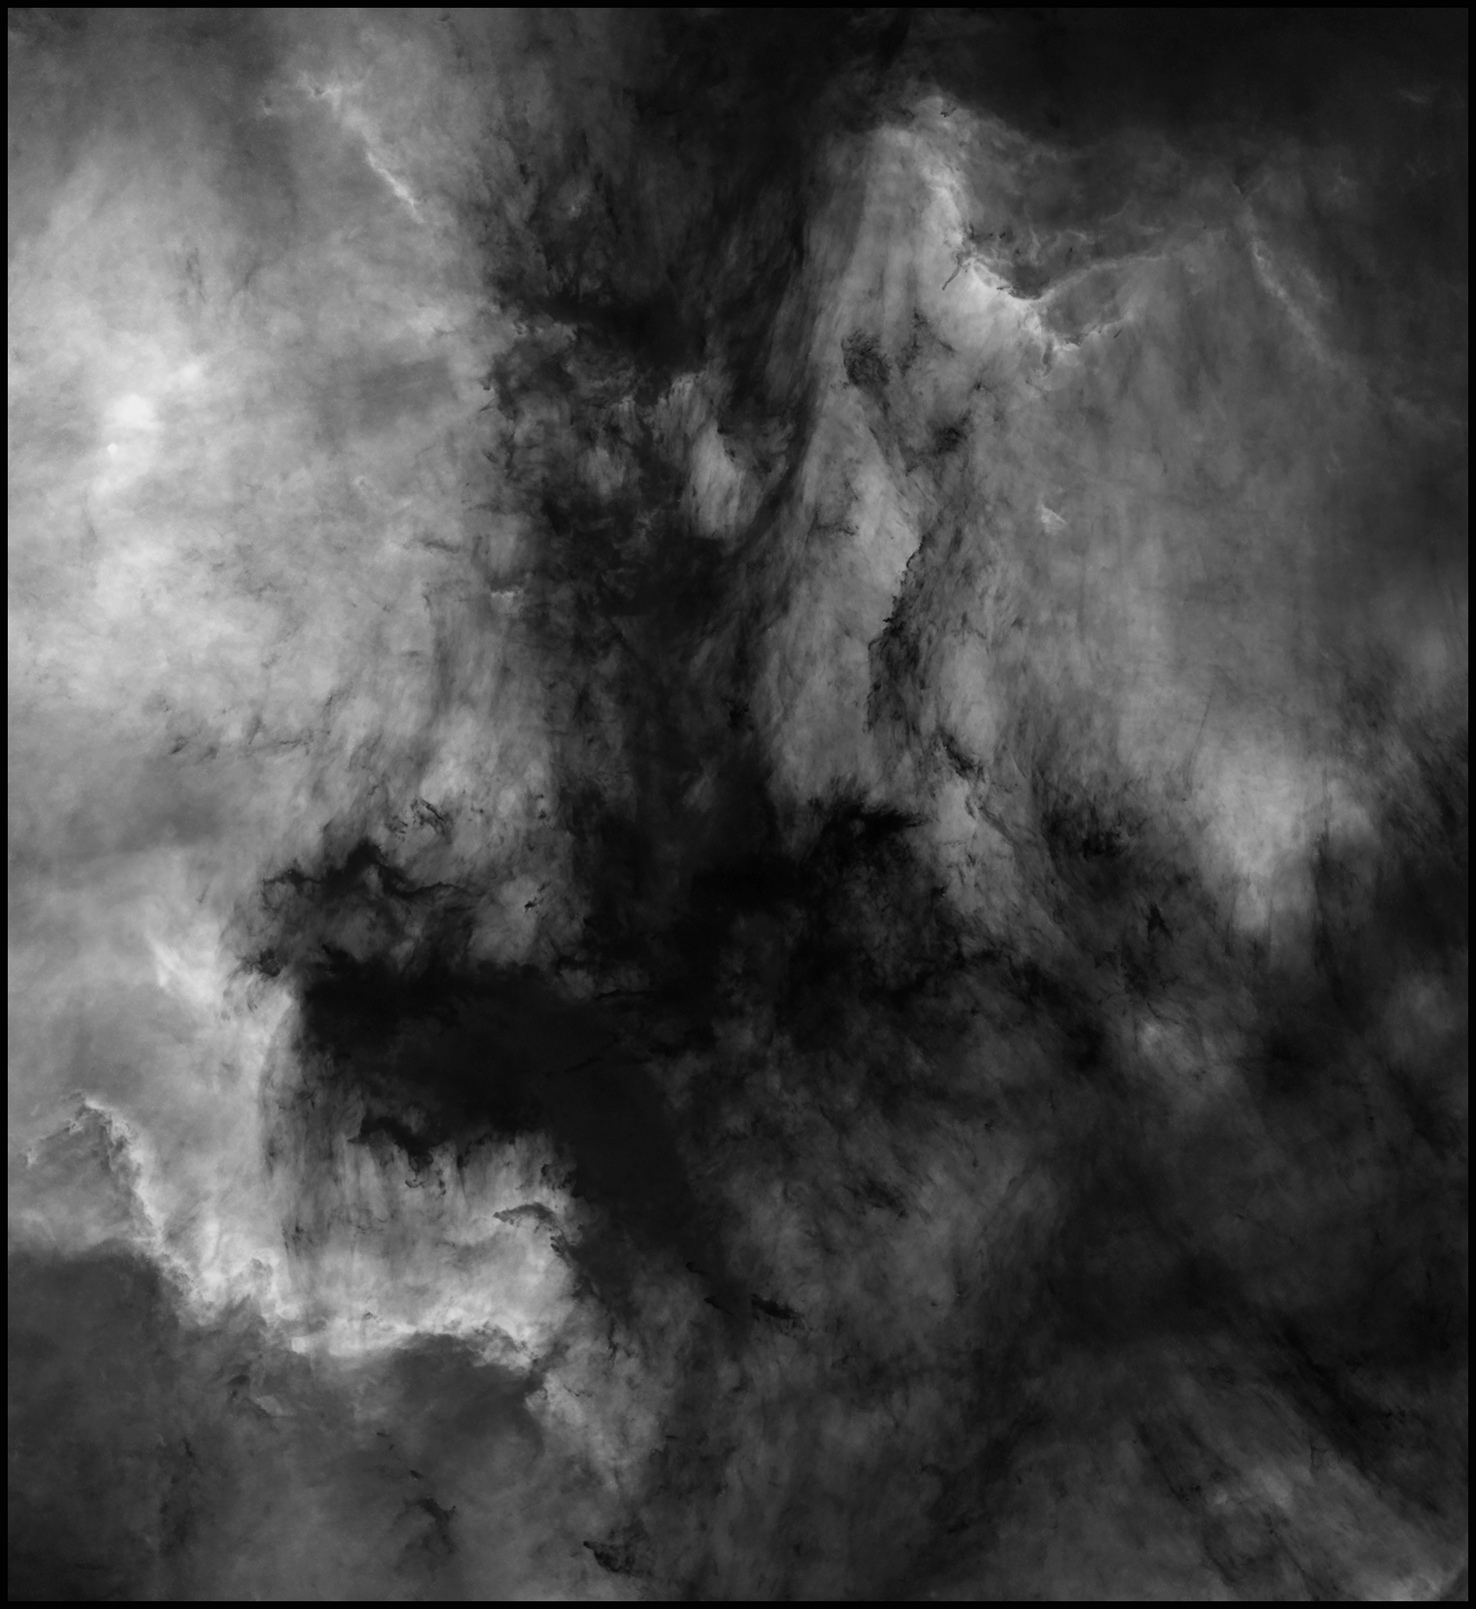 ngc7000-starless.jpg